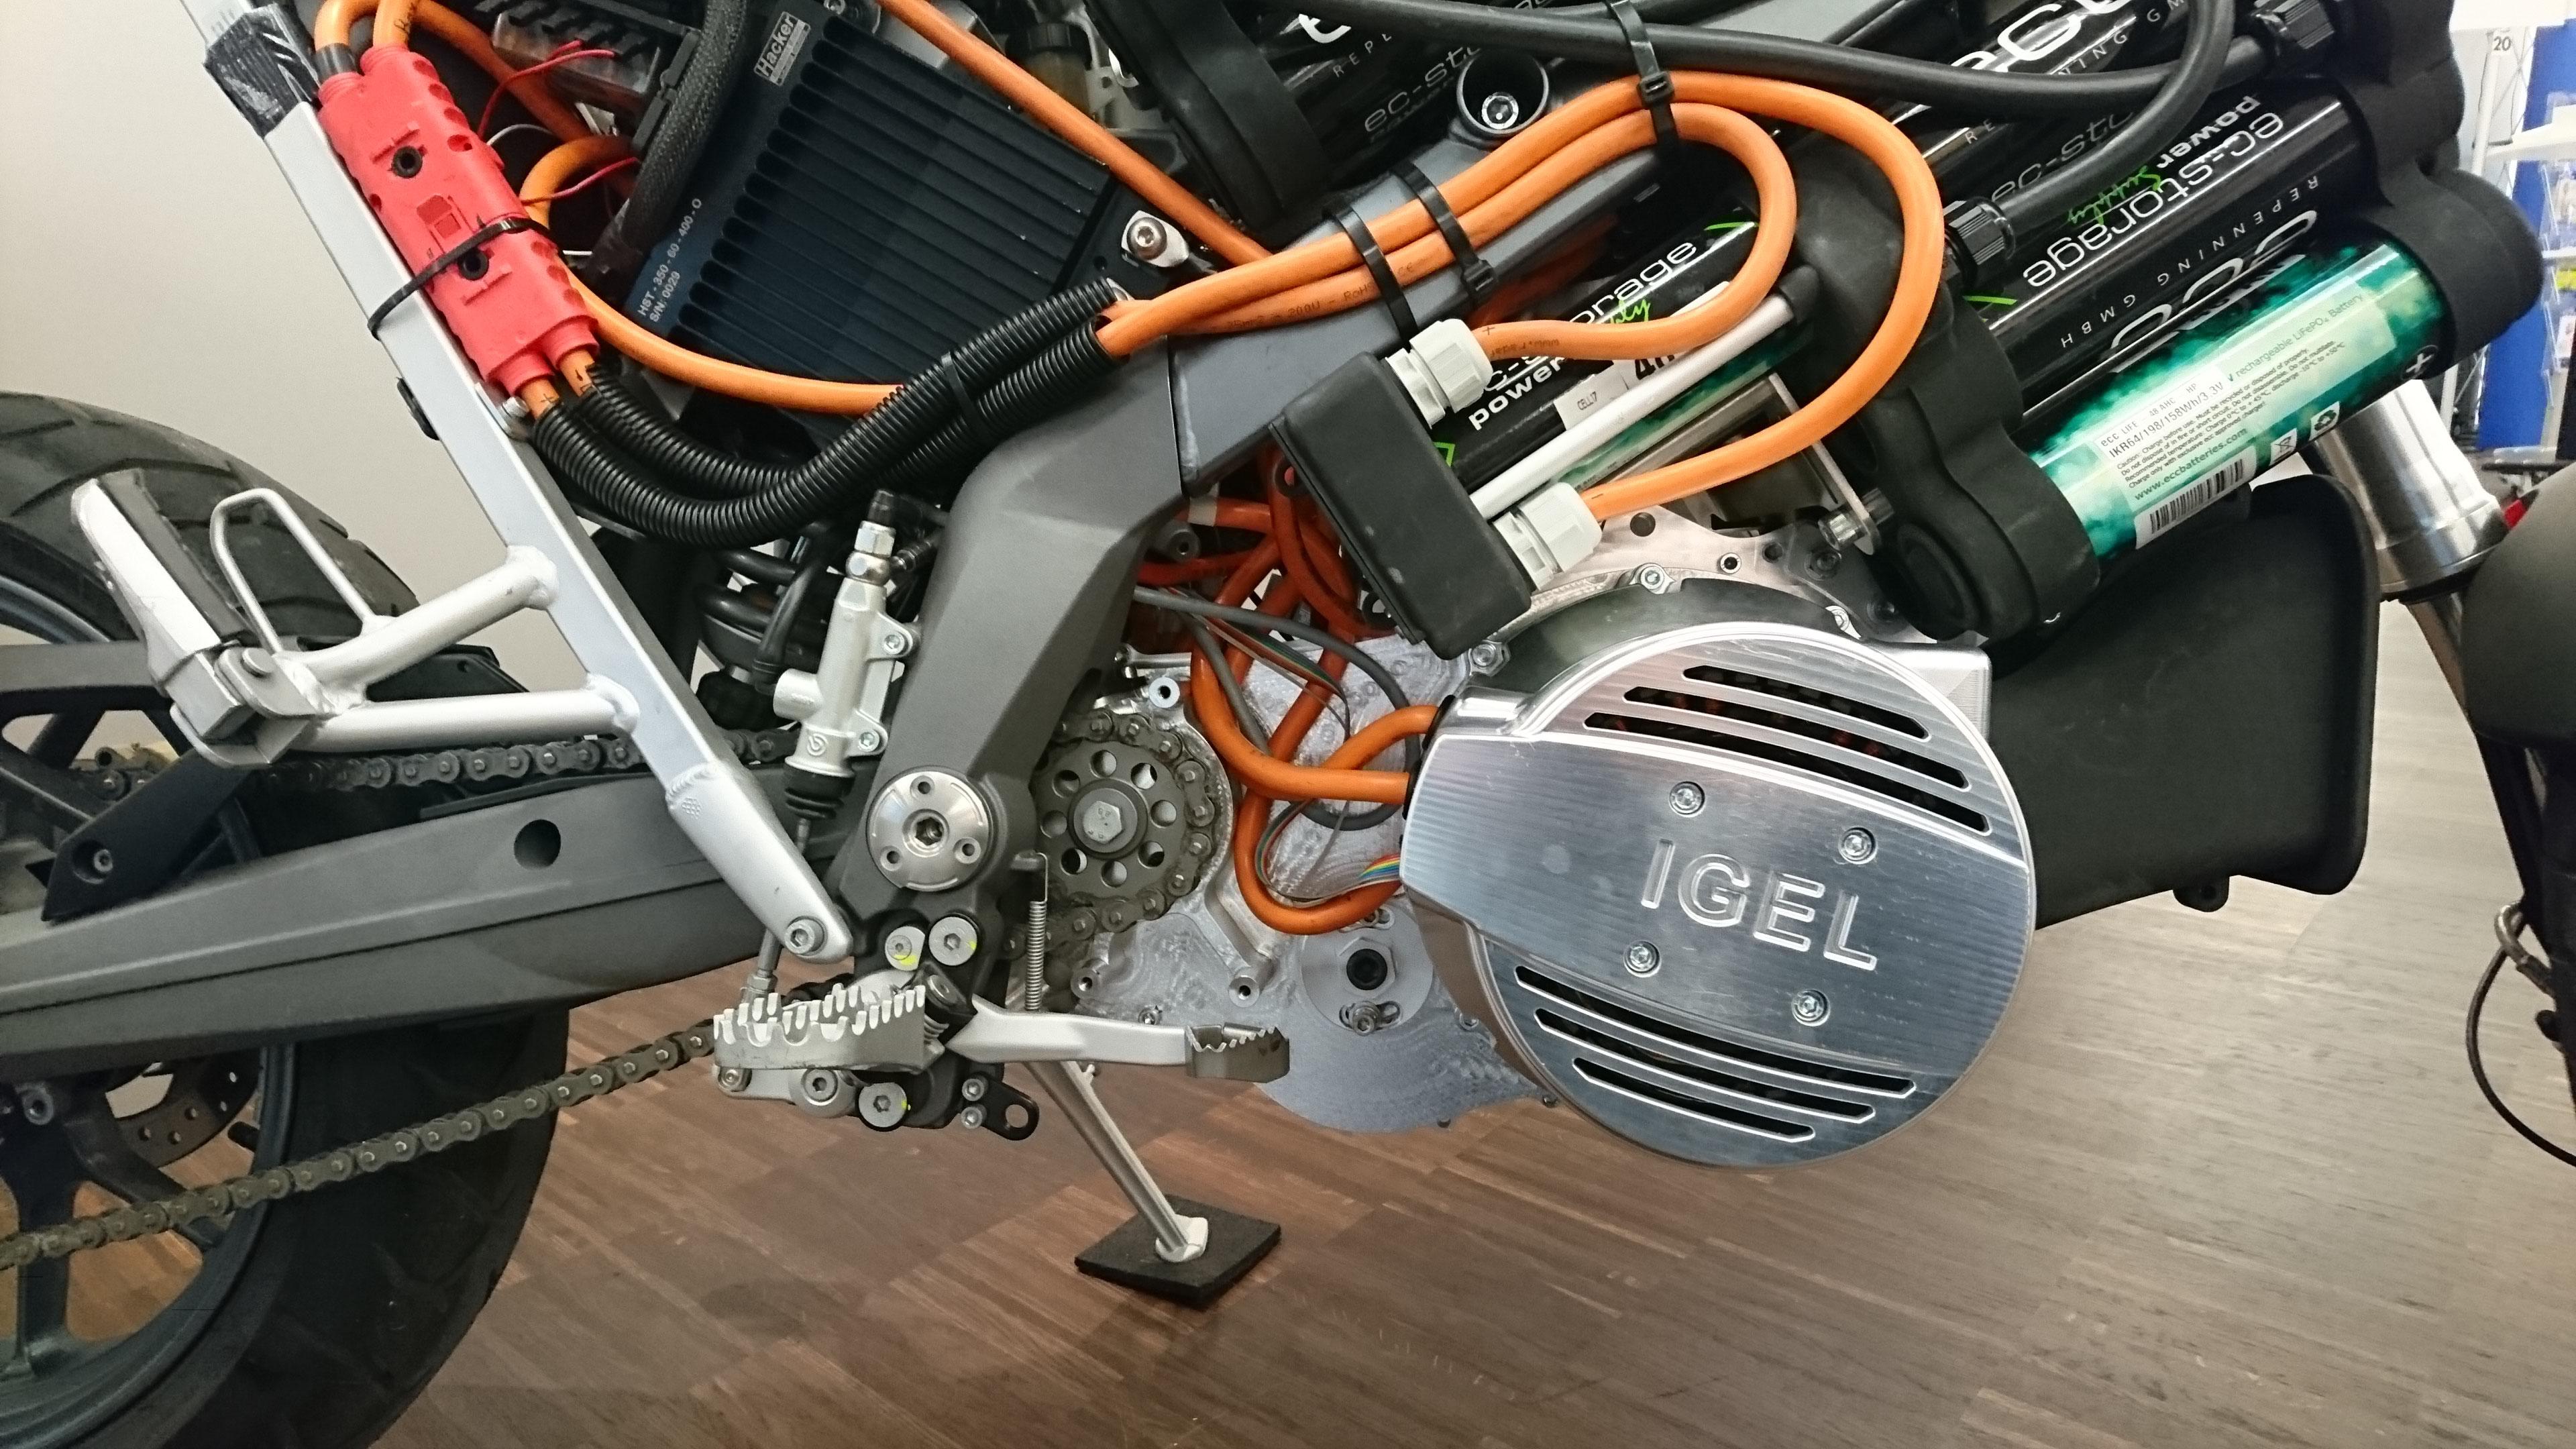 Fantastisch Motorrad Elektrische Verkabelung Ideen - Der ...